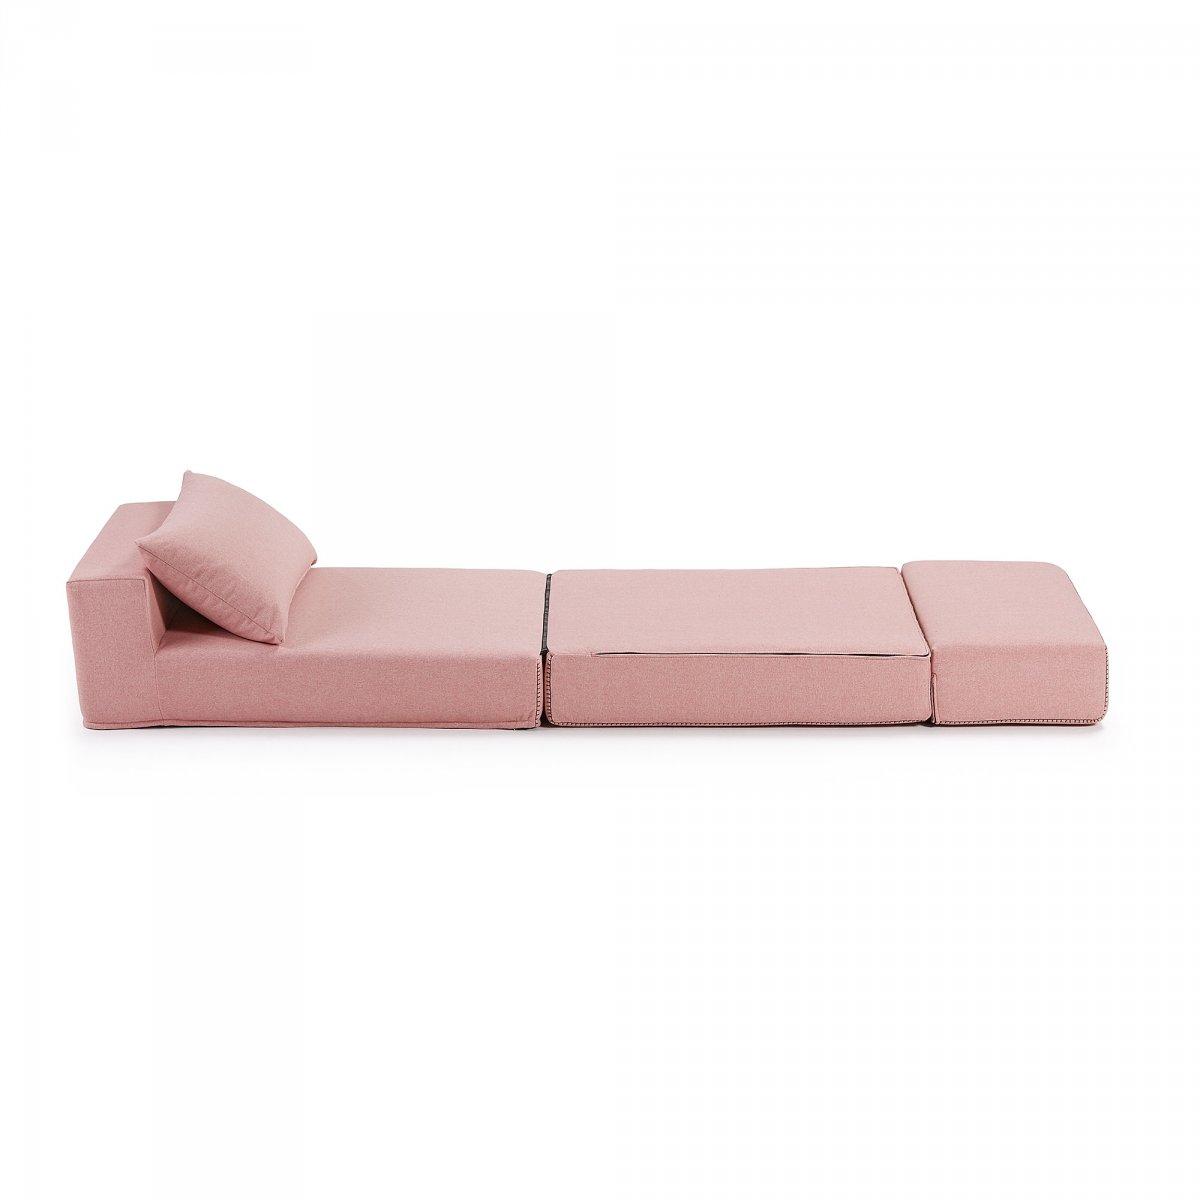 Keihome Linea J Pouf Letto ARTY tessuto rosa